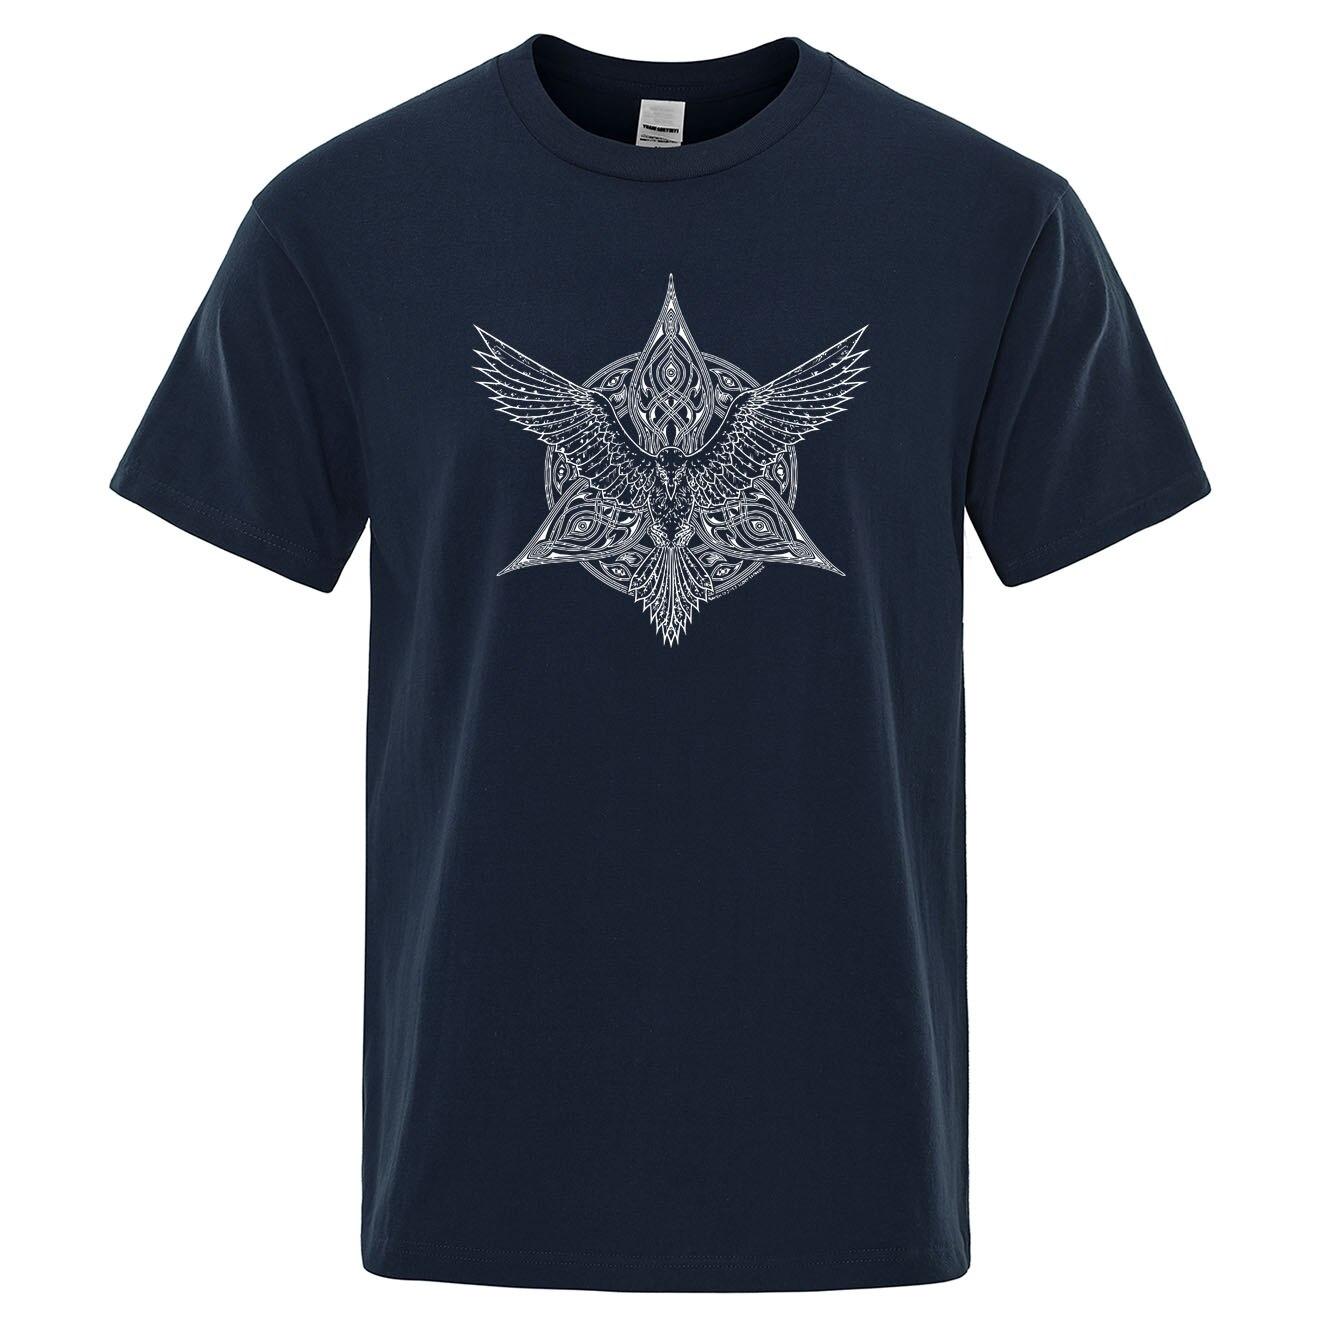 Odin Vikings Tshirt Men Ragnar Raven T Shirt 2019 Summer Cotton Tops O-Neck Short Sleeve Mens T-Shirt TV Show Viking Legend Tees